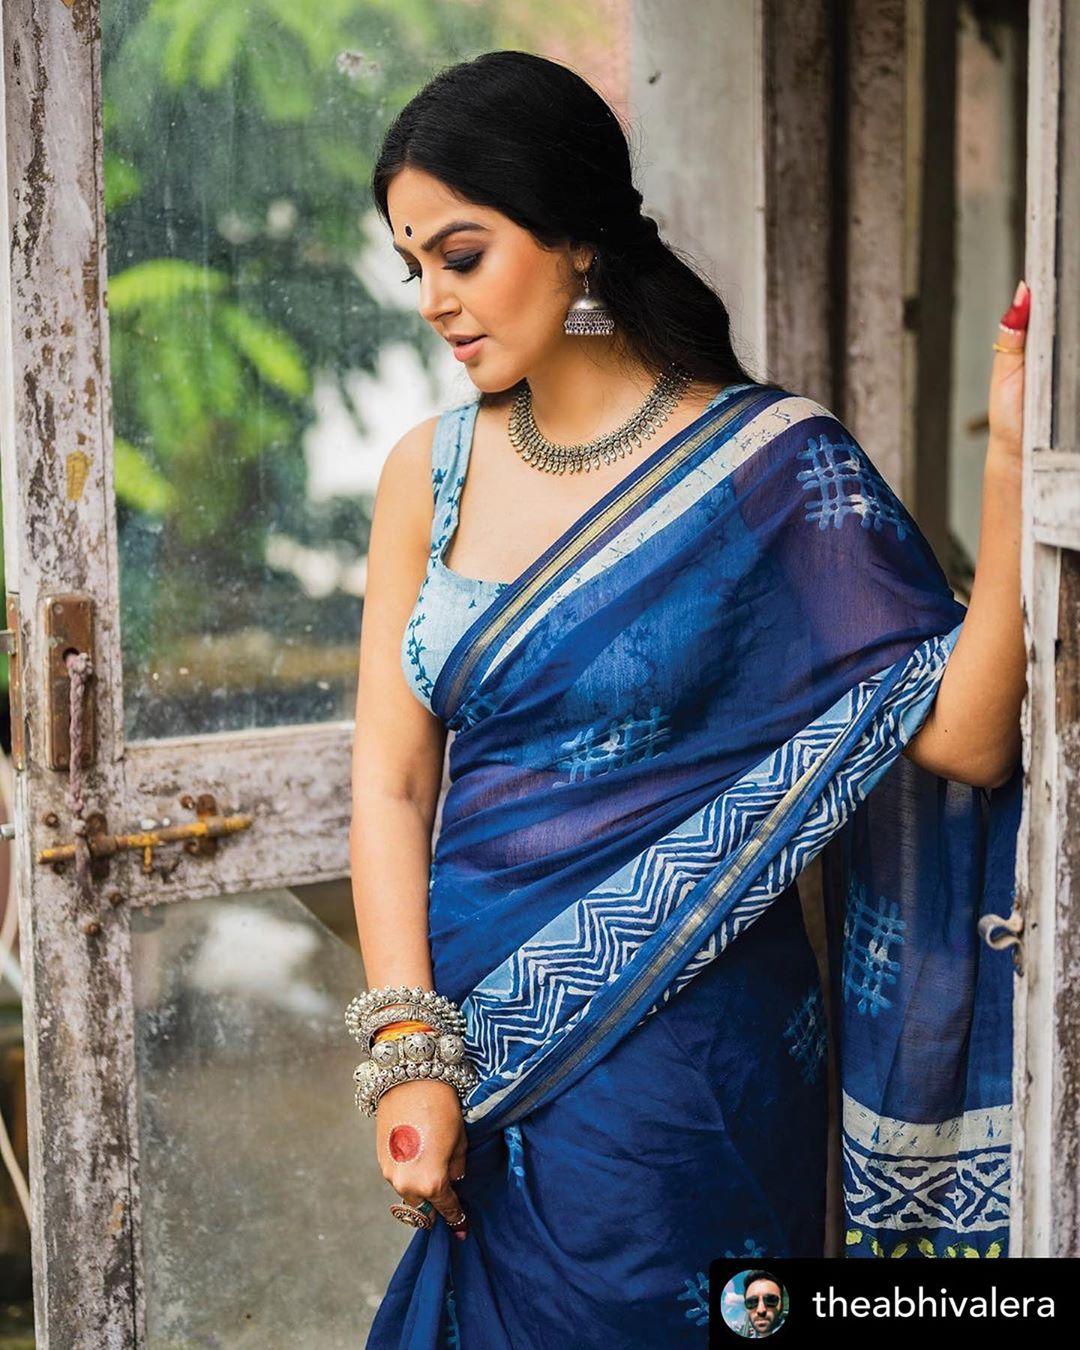 Bigg Boss Telugu 4 fame Monal Gajjar hot Photos and movie news